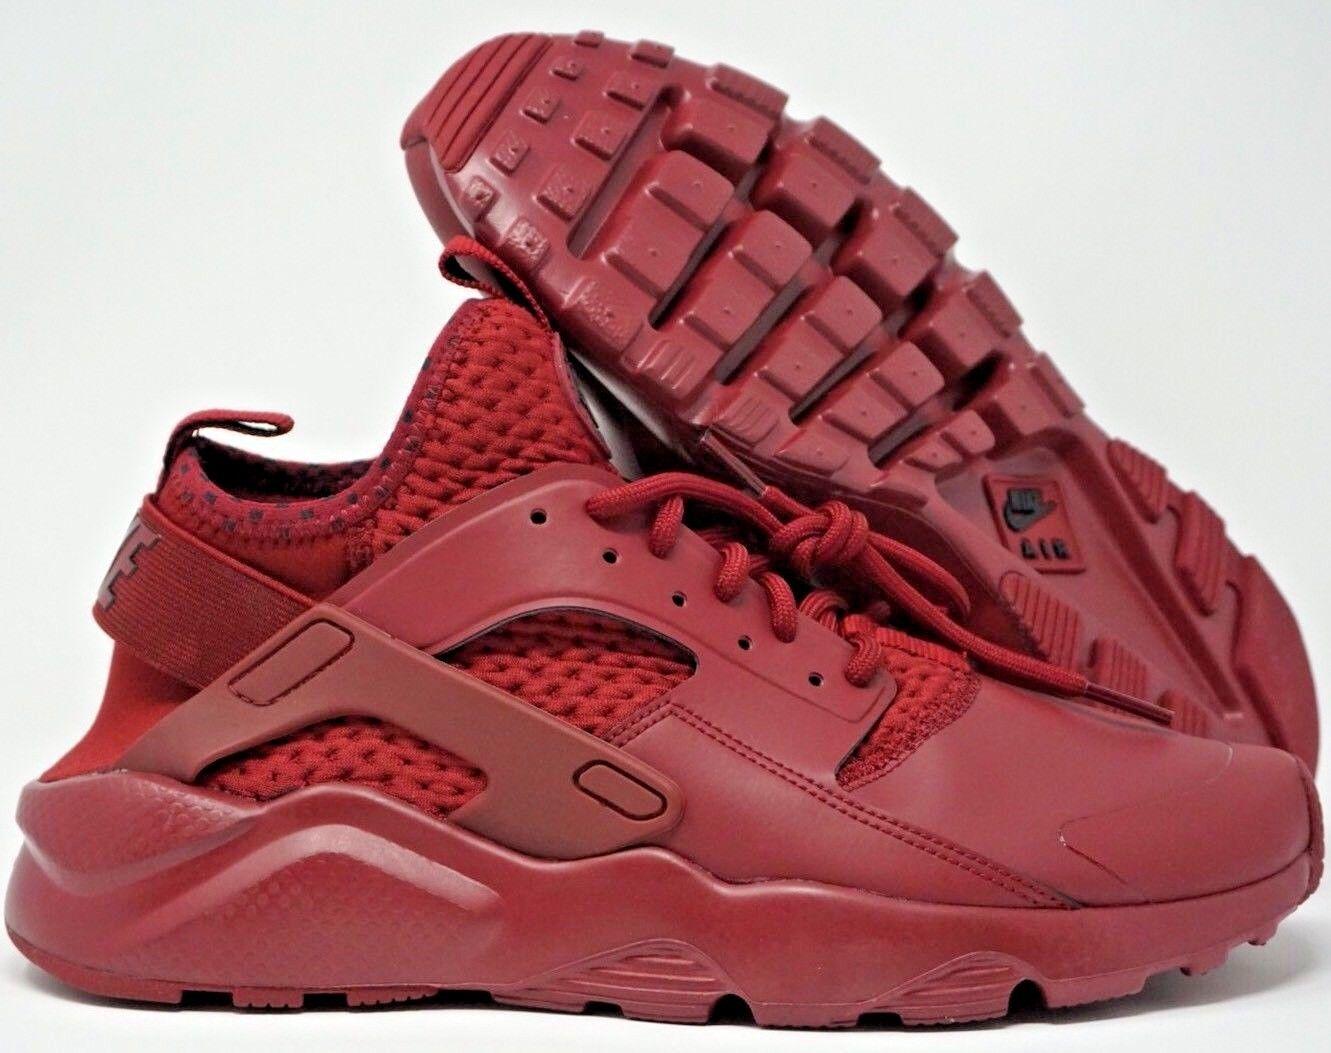 Nike Huarache Run Ultra SE Mens Running Shoes Team Red Black Maroon Comfortable Wild casual shoes